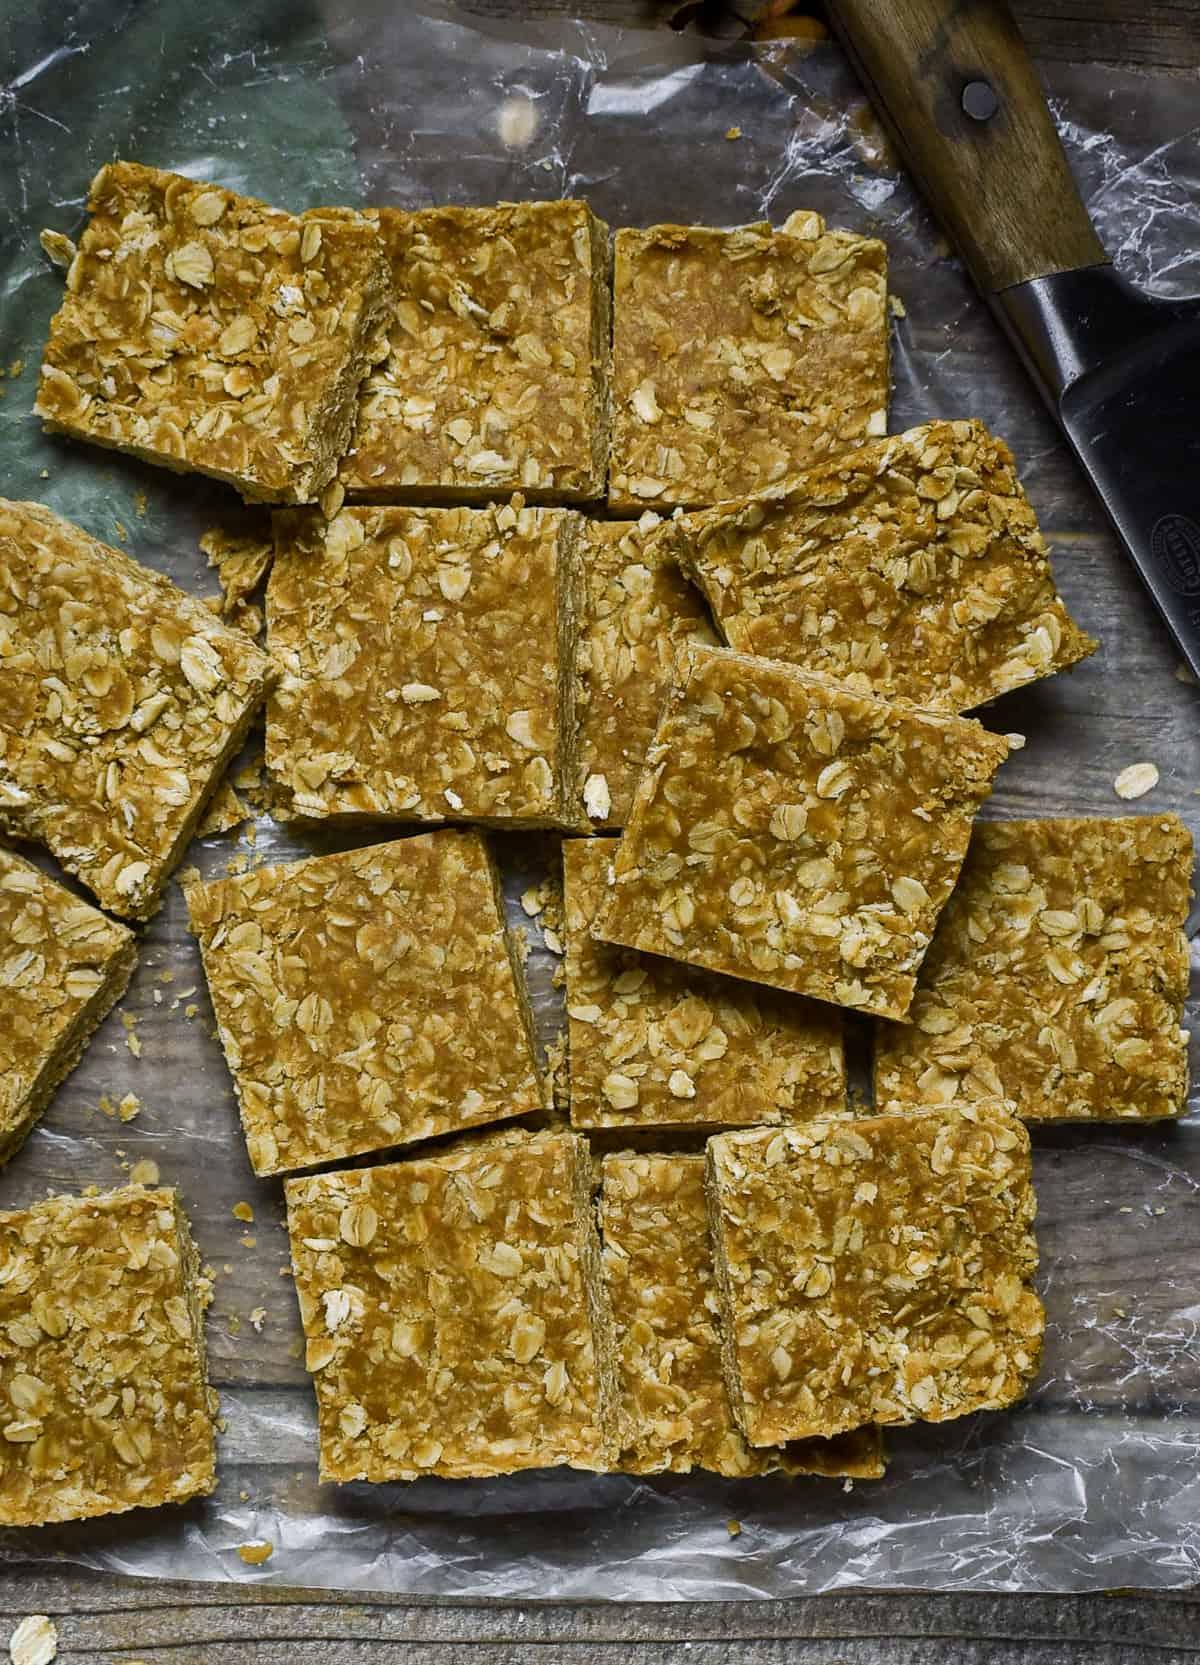 Peanut butter oatmeal bars on wax paper.